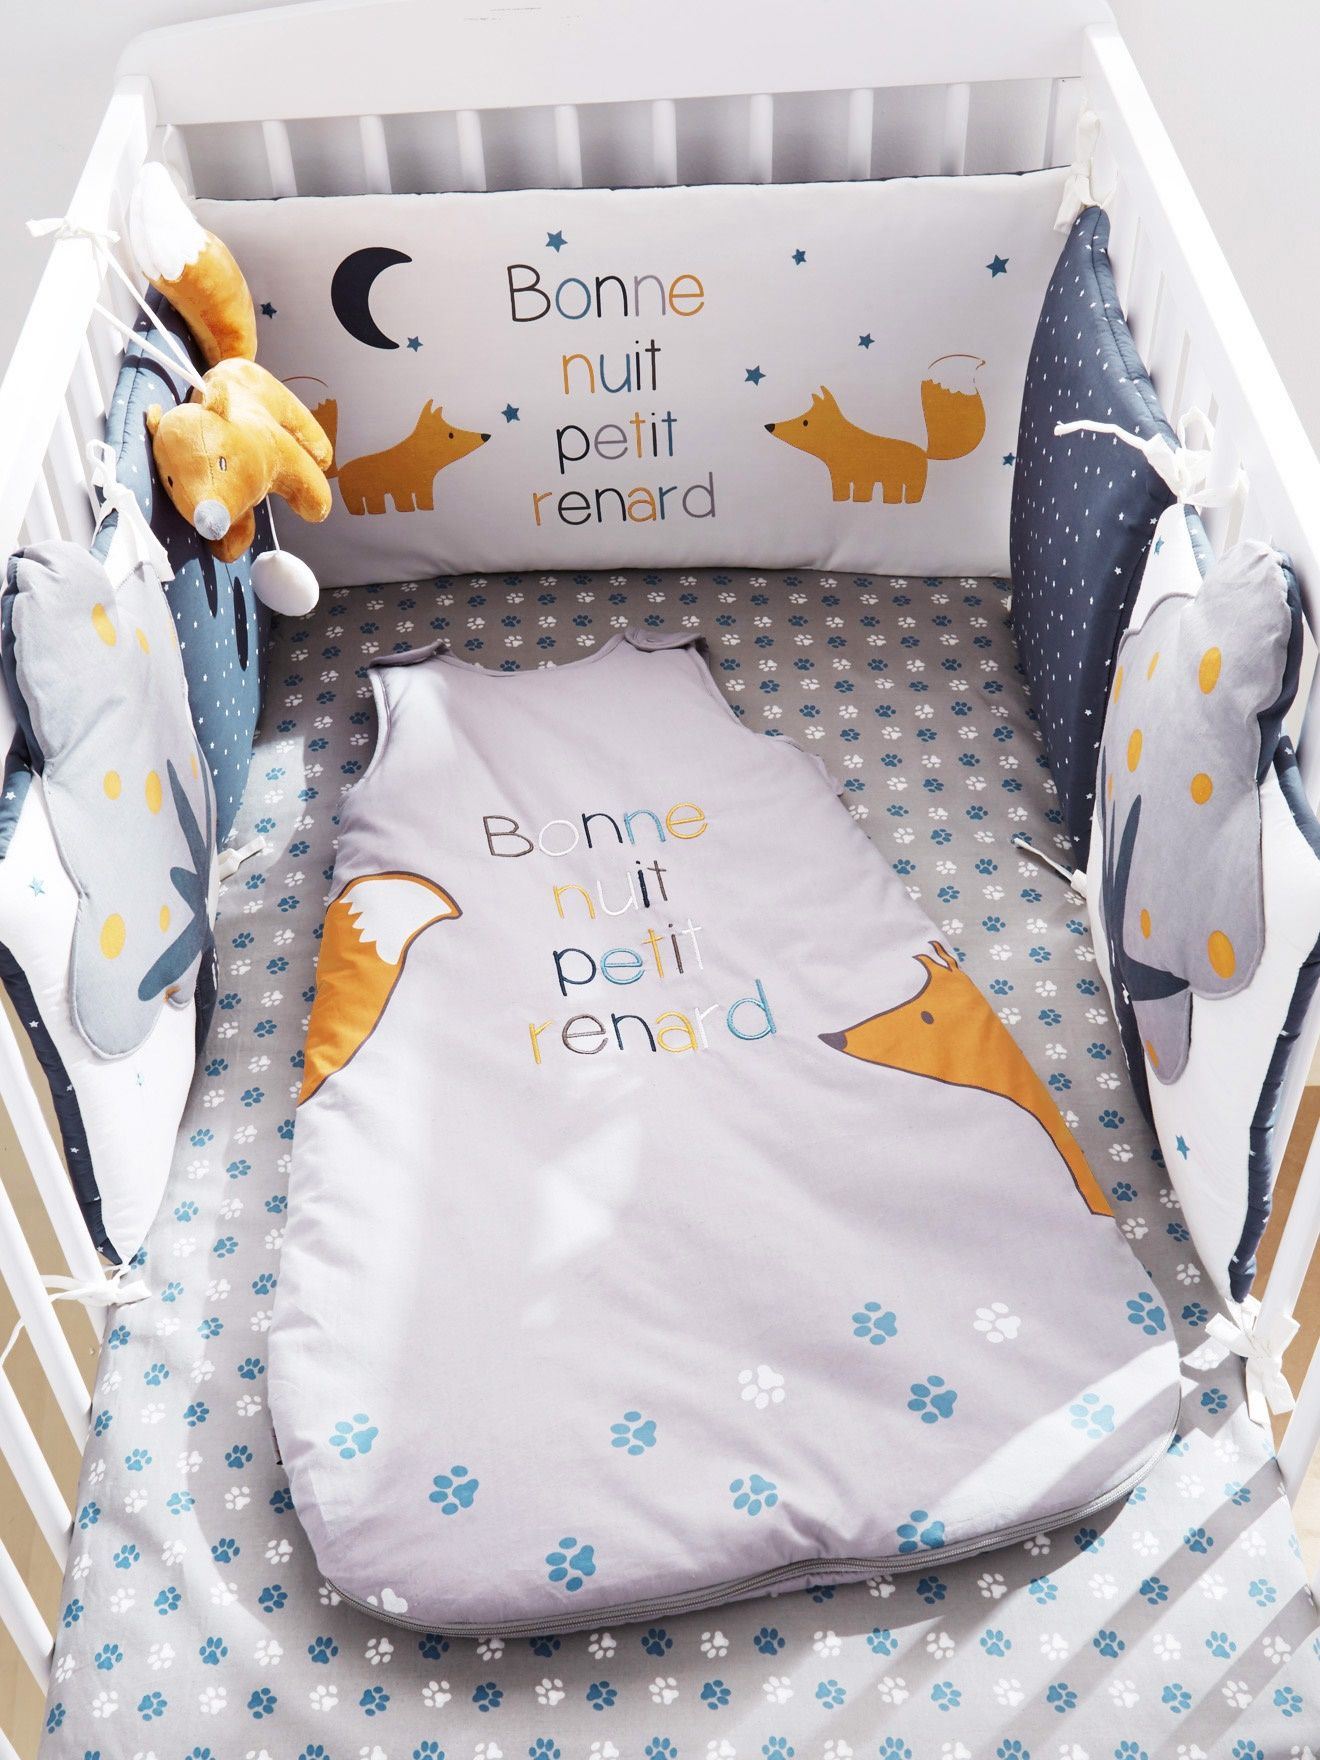 Tour de lit bébé Petit Renard bleu nuit - Vertbaudet | business ...